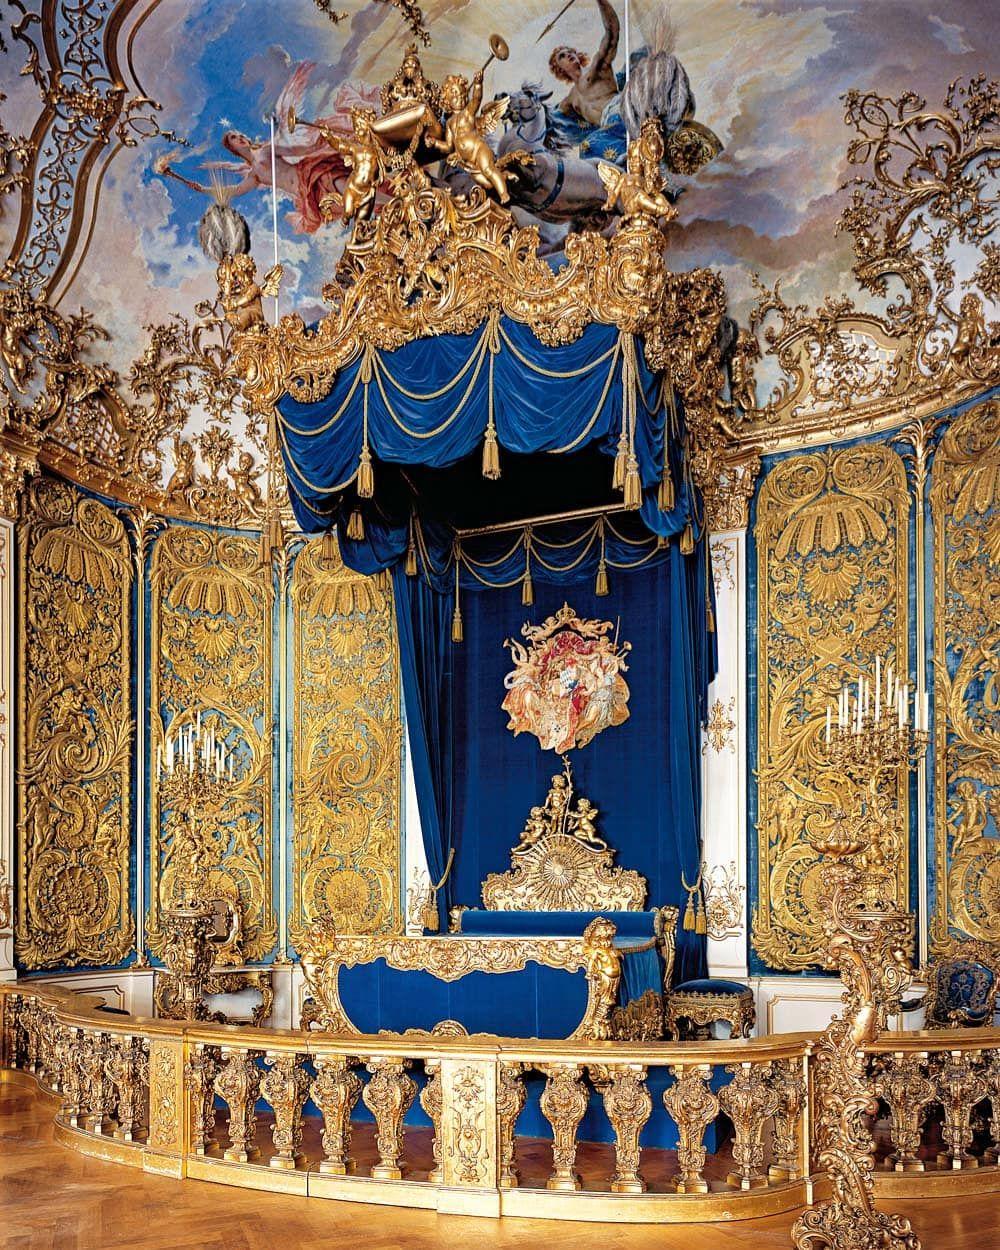 𝗩𝗘𝗥𝗦𝗔𝗜𝗟𝗟𝗘𝗦𝗔𝗗𝗡𝗘𝗦𝗦 On Instagram Let S Spend The Week Exploring The Wonderful Schloss Linder Inside Castles Castles Interior Linderhof Palace